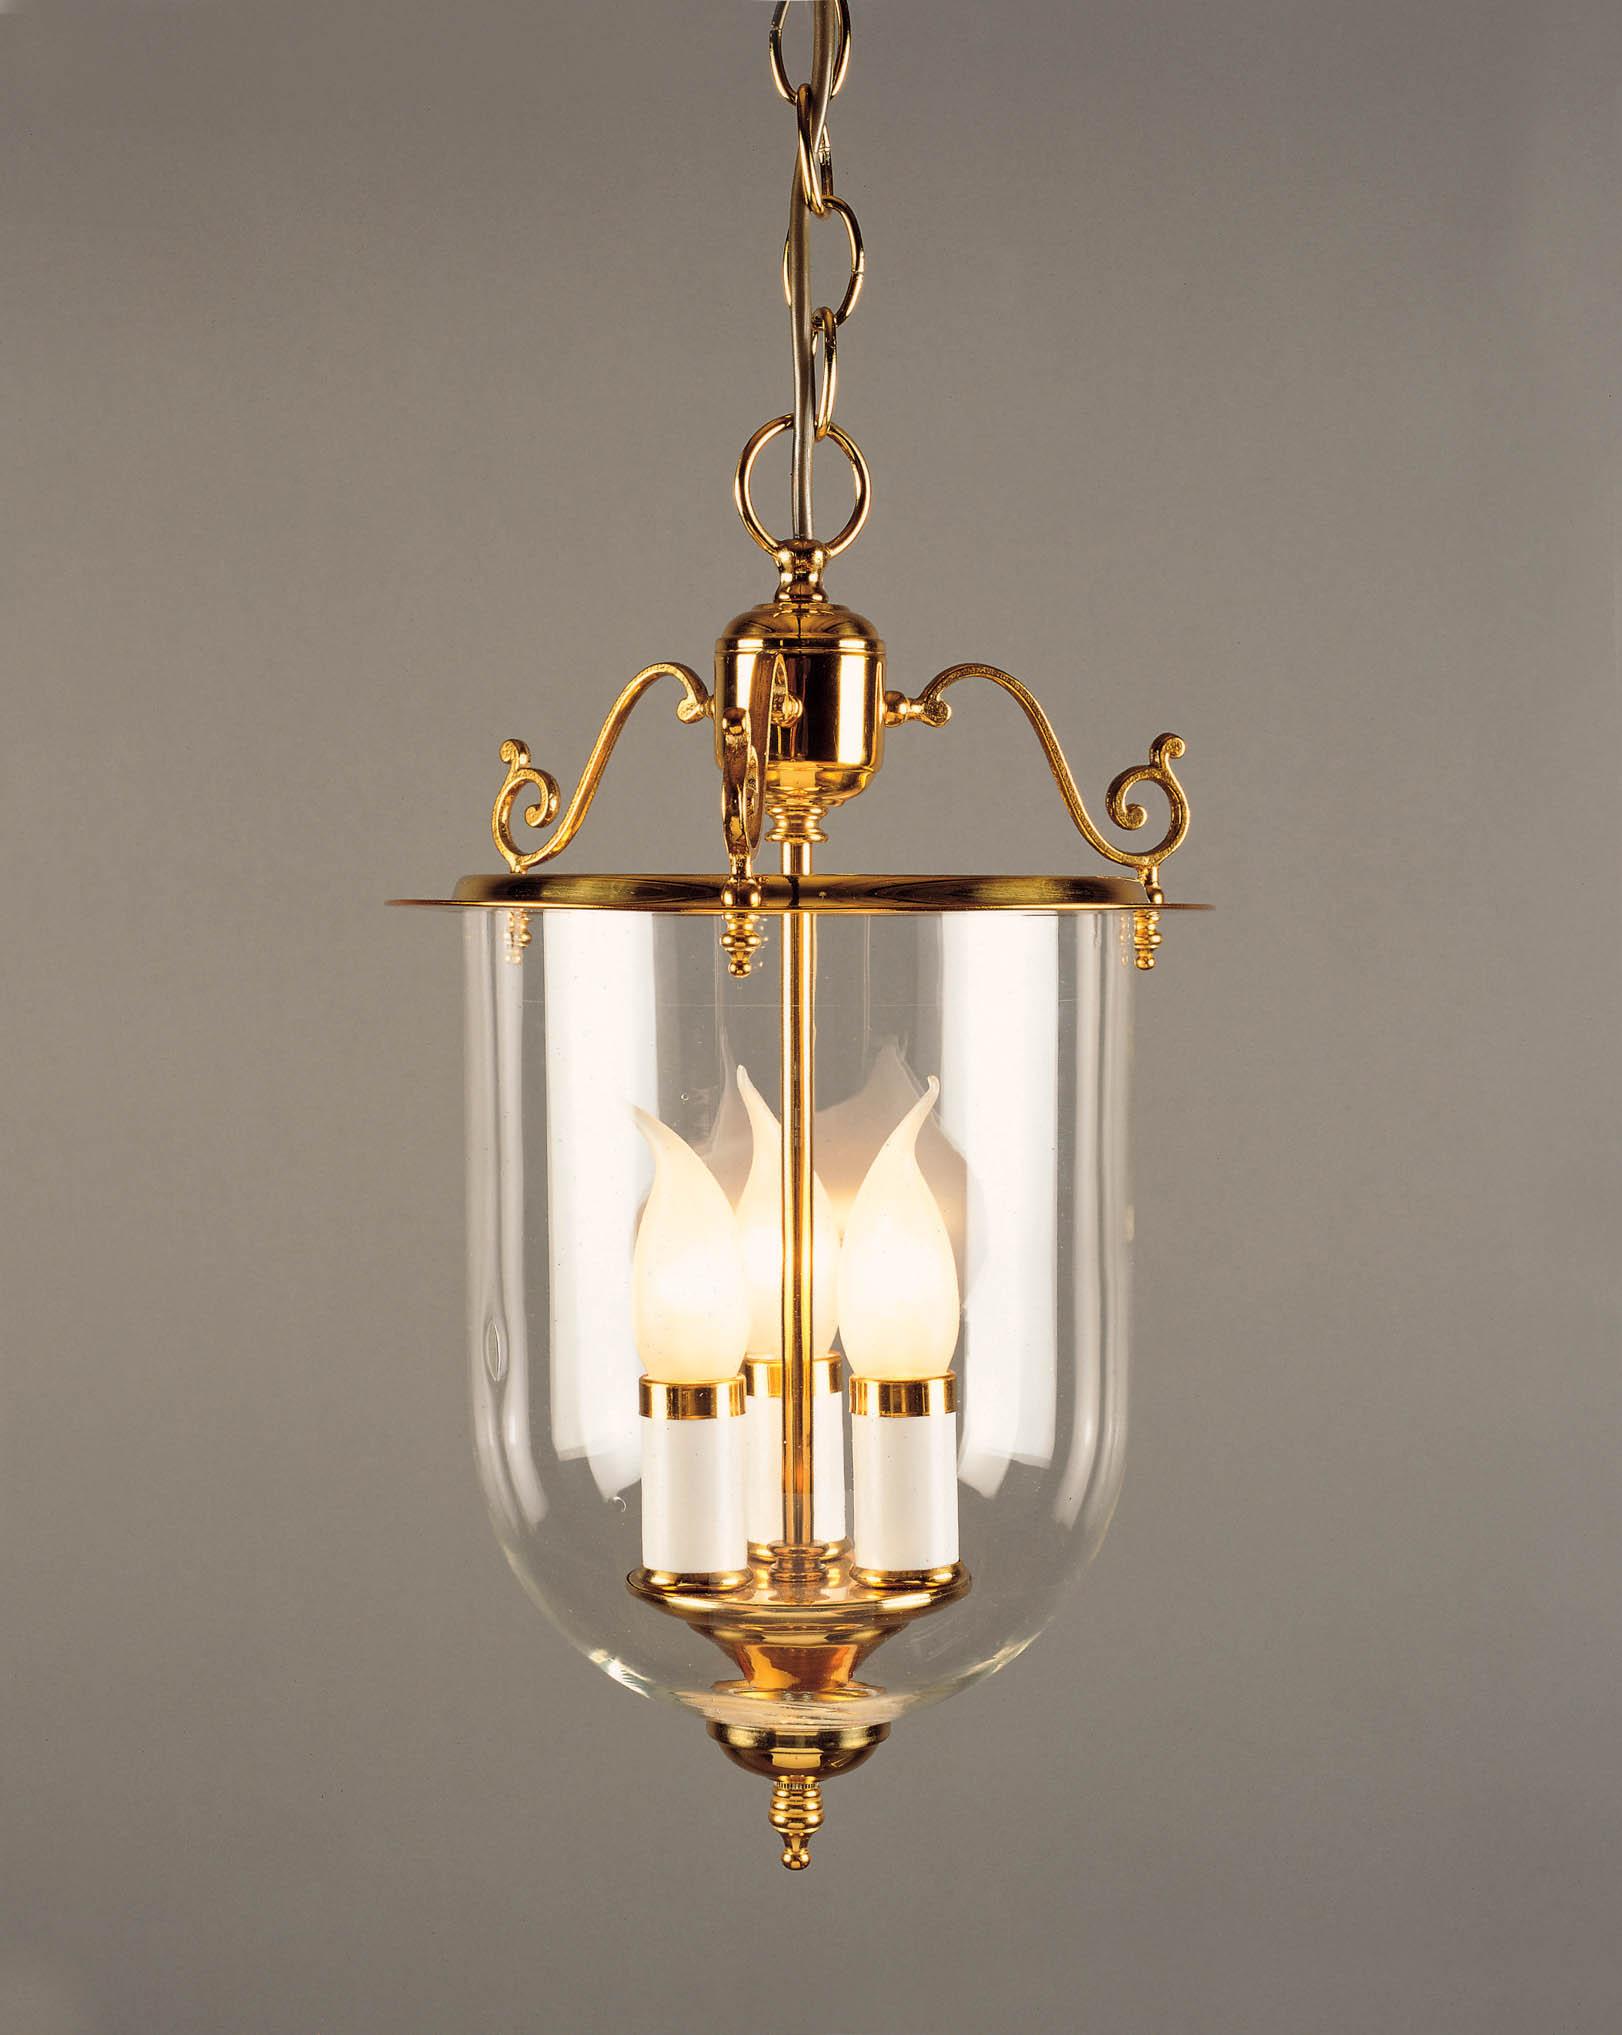 Impex LG07001/8.5 Granada 3 light Lantern, Polished Brass